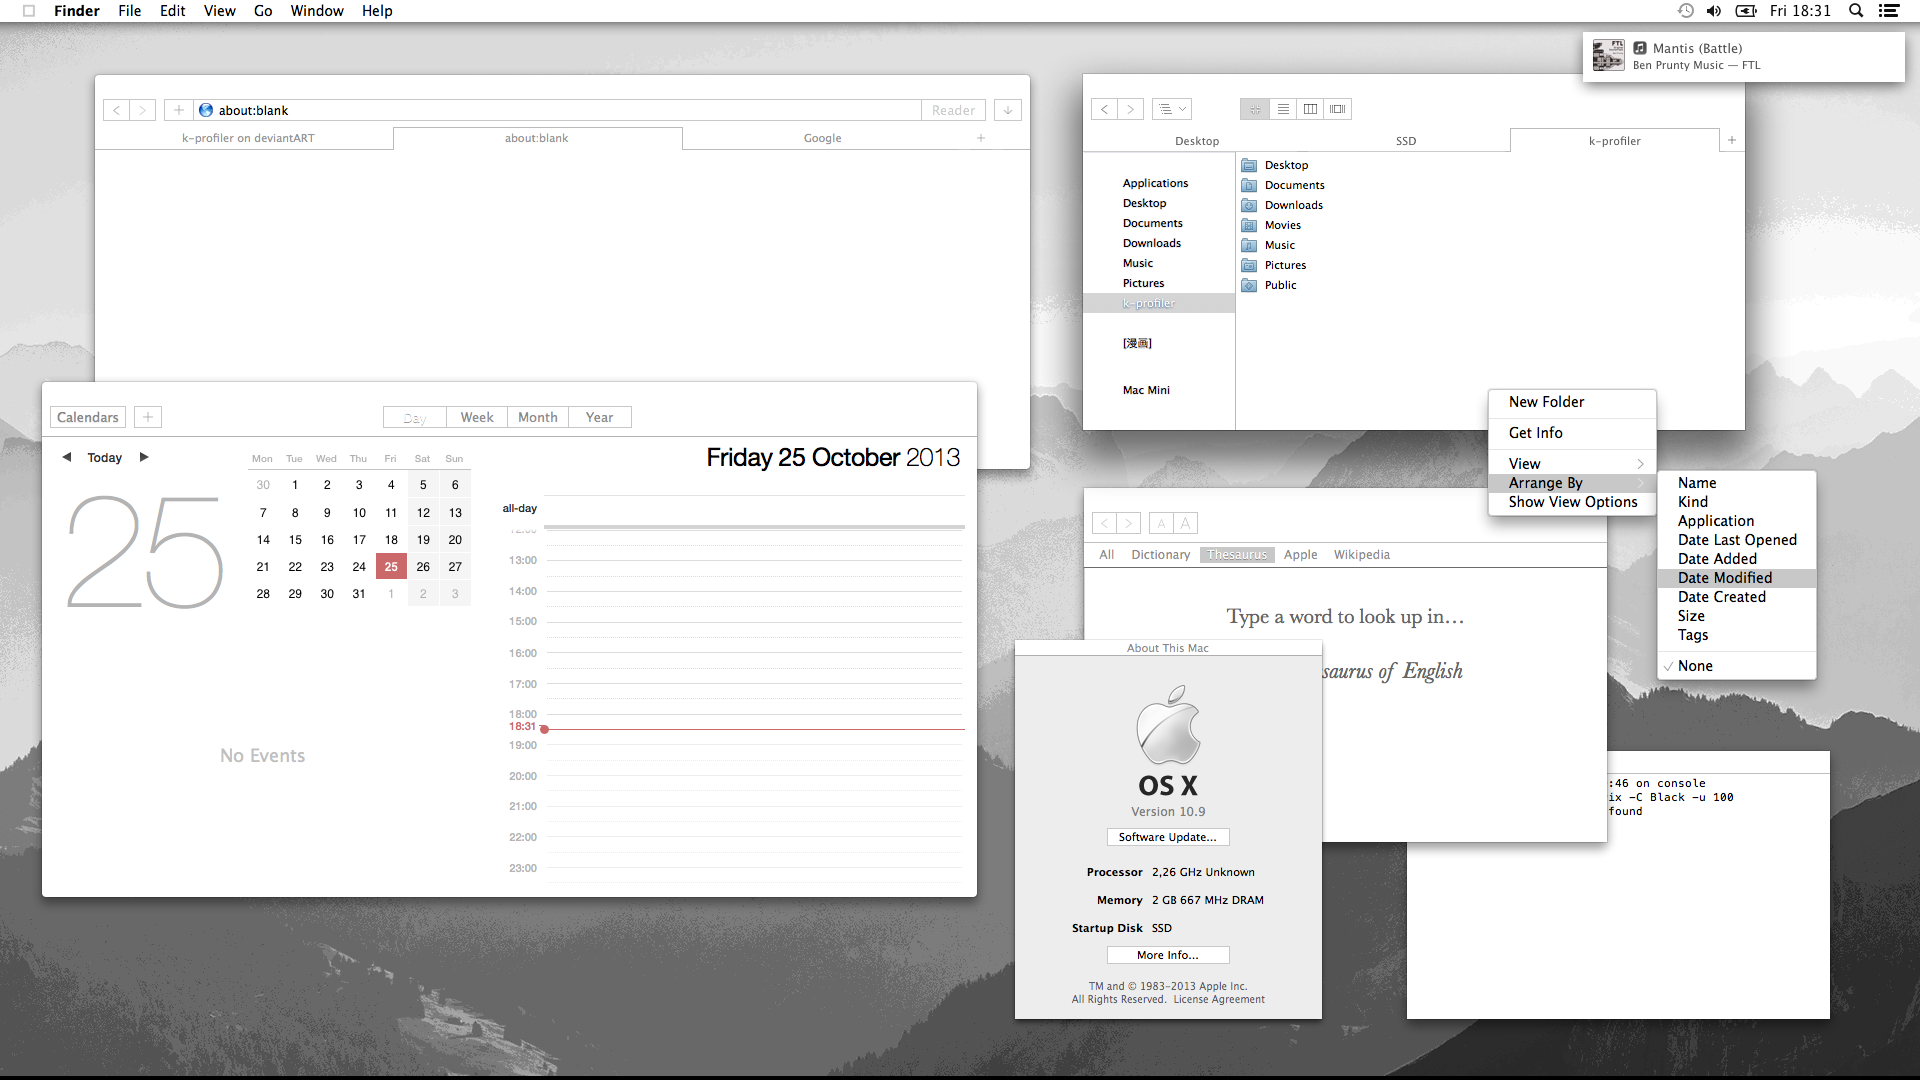 Minimal Theme for Mavericks (with Installer!) by k-profiler